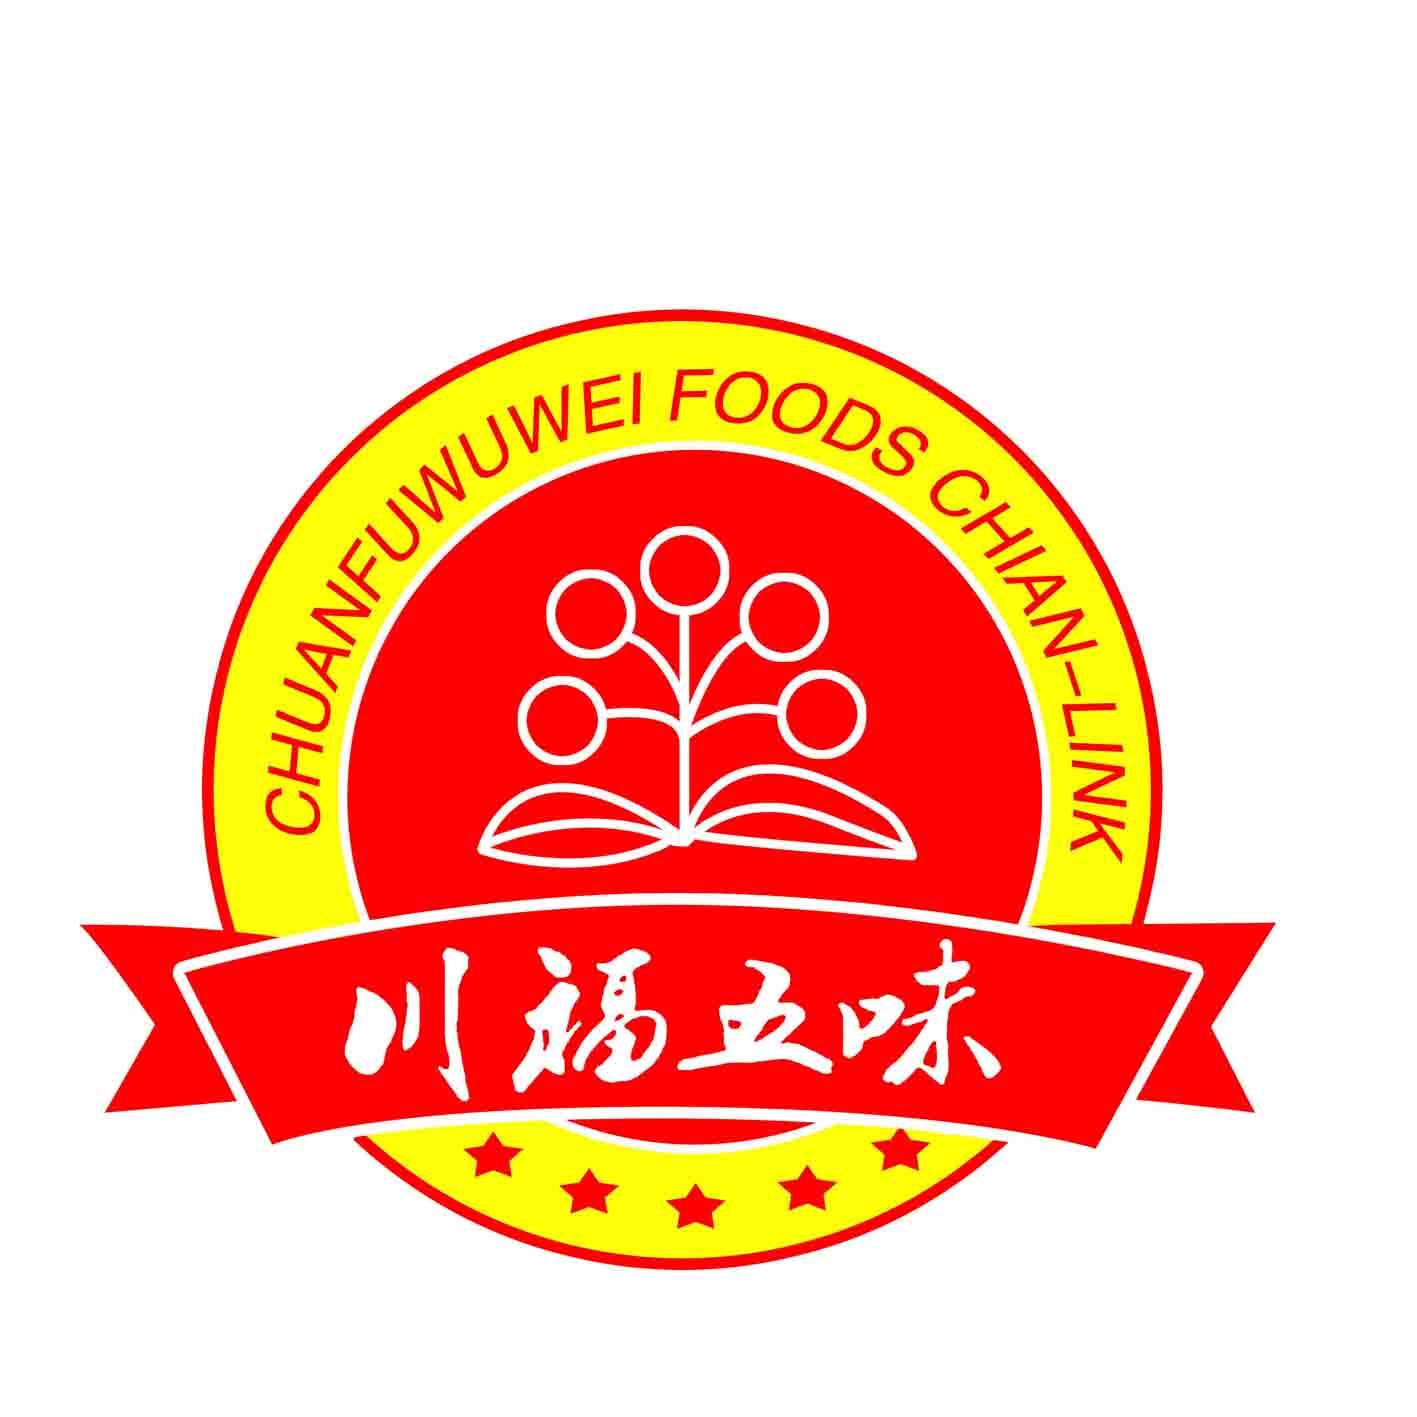 logo logo 标志 设计 图标 1417_1417